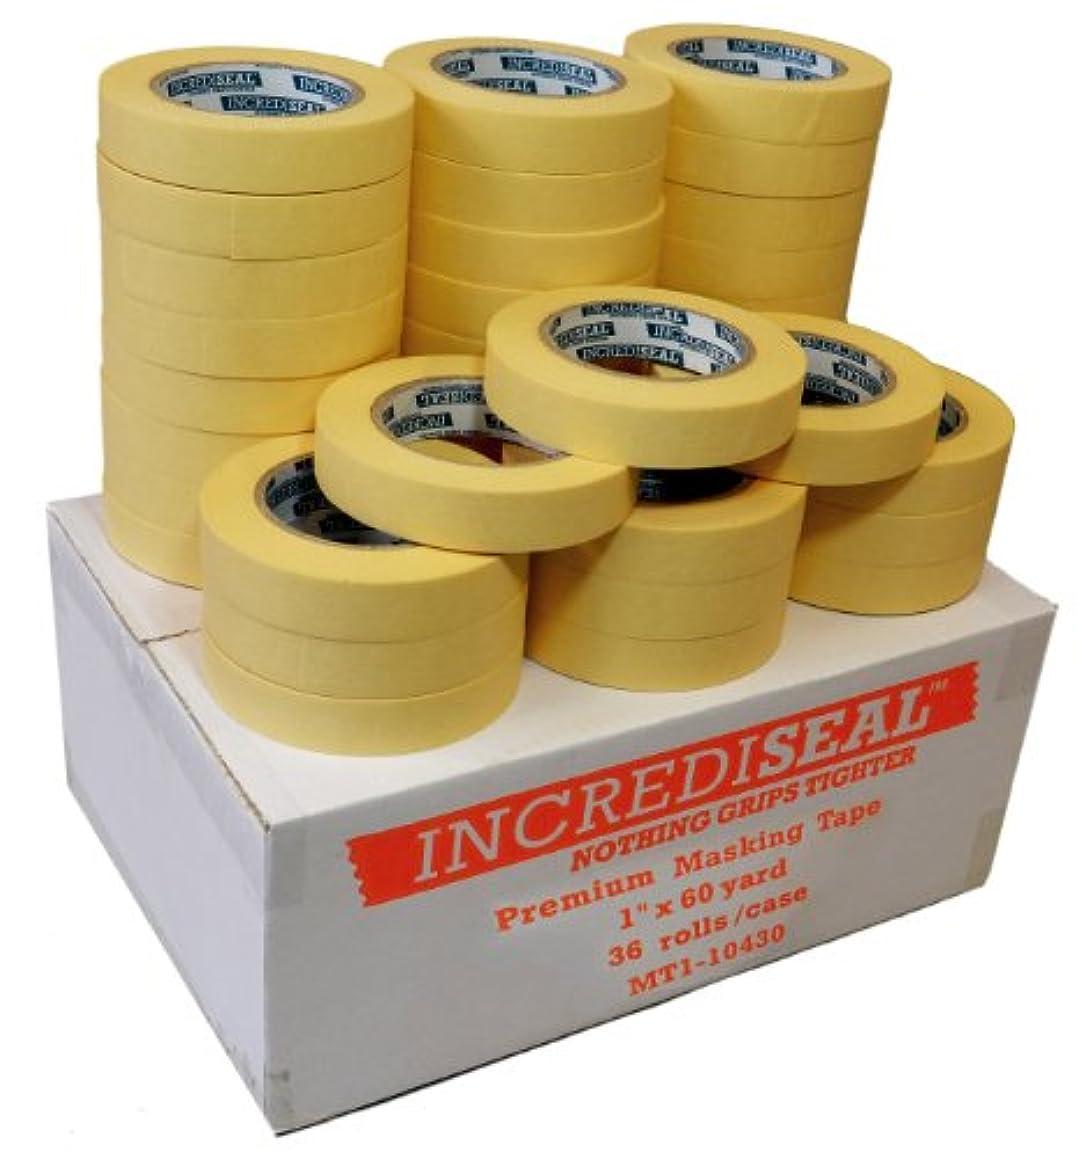 INCREDISEAL 36 Rolls High Tack Tape, 1 Inch x 60 Yards x 4.3 Mil - Crepe / Natural